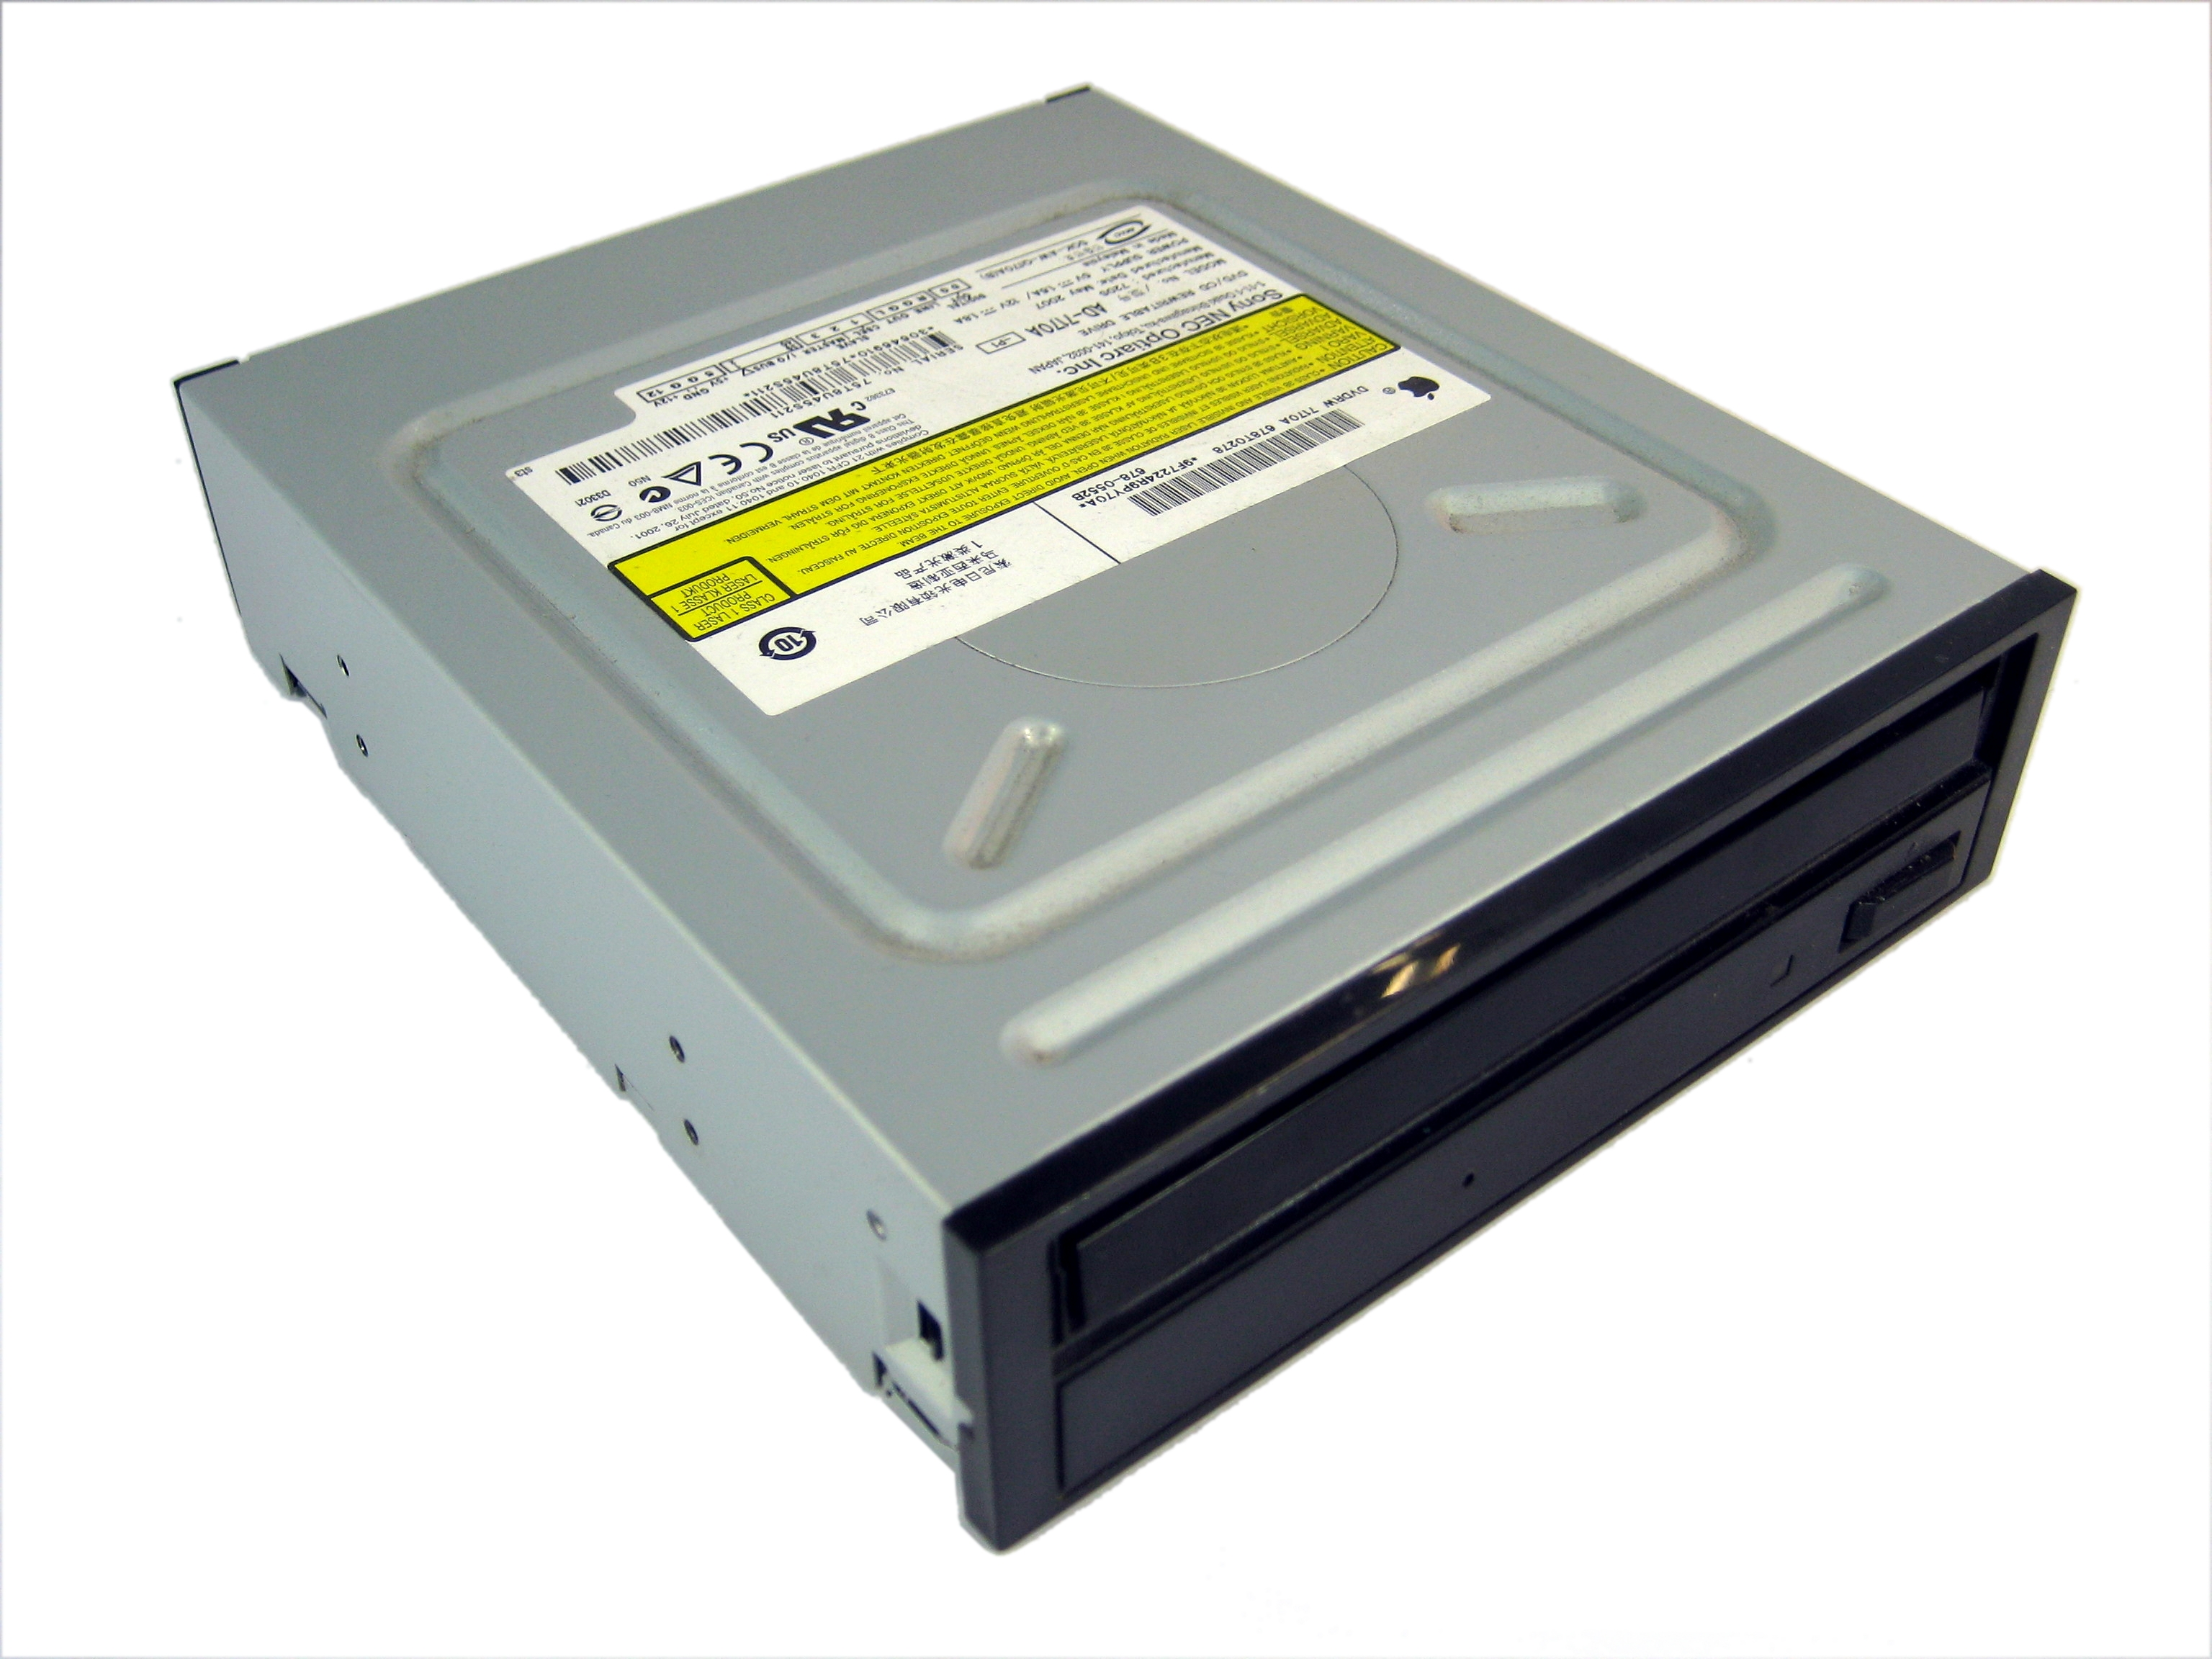 OPTIARC DVD RW AD 7170A ATA DEVICE DRIVERS FOR MAC DOWNLOAD